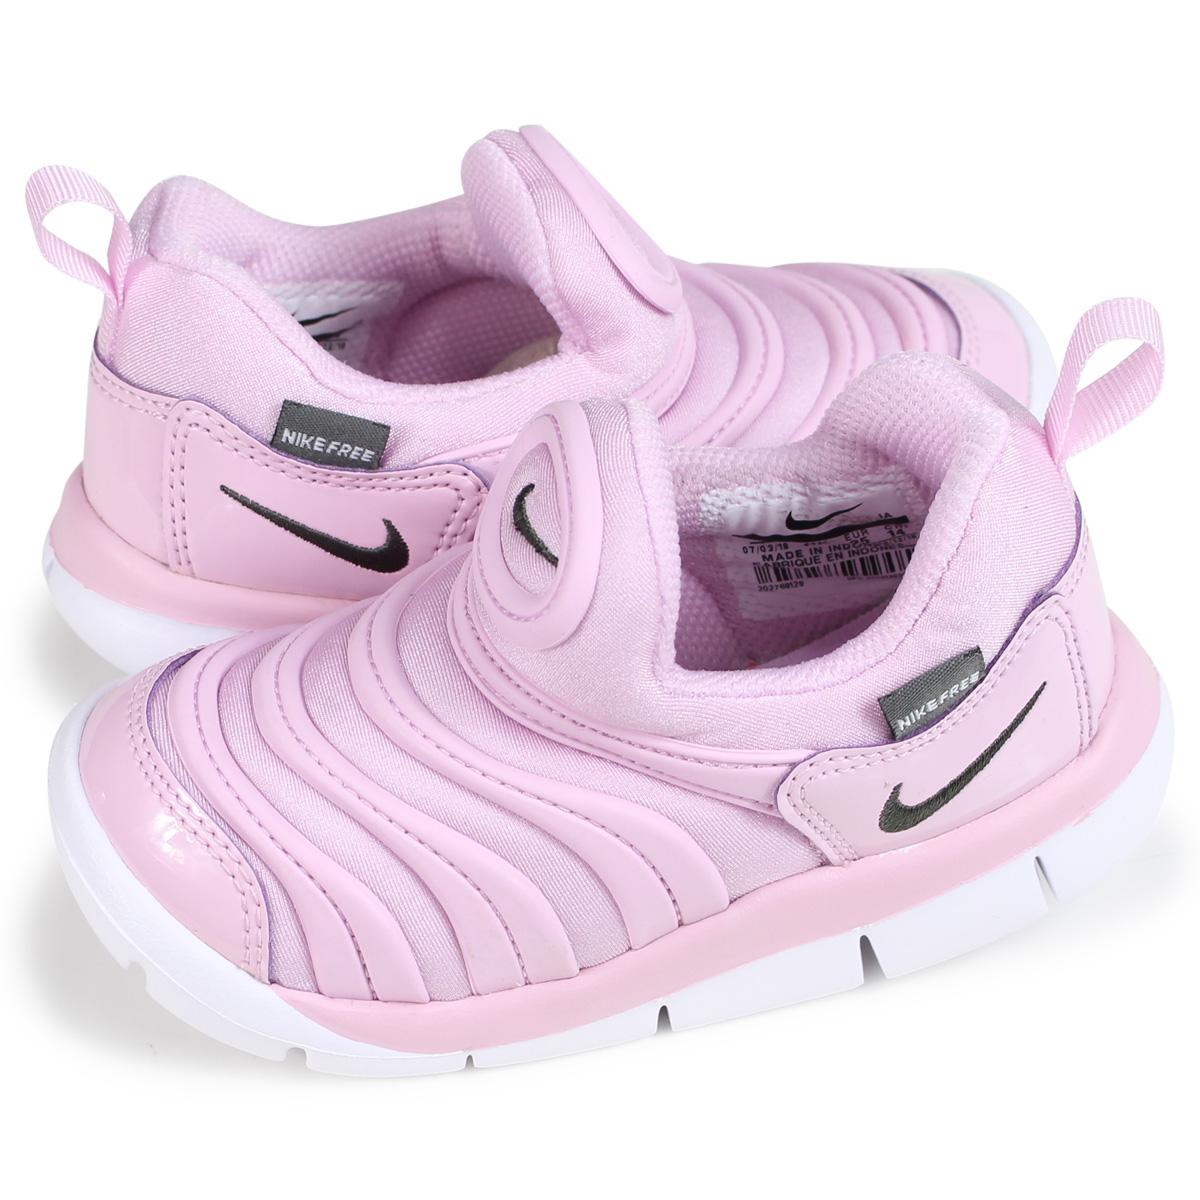 latest buy cheap fresh styles NIKE DYNAMO FREE TD Nike dynamo-free baby sneakers 343,938-628 pink